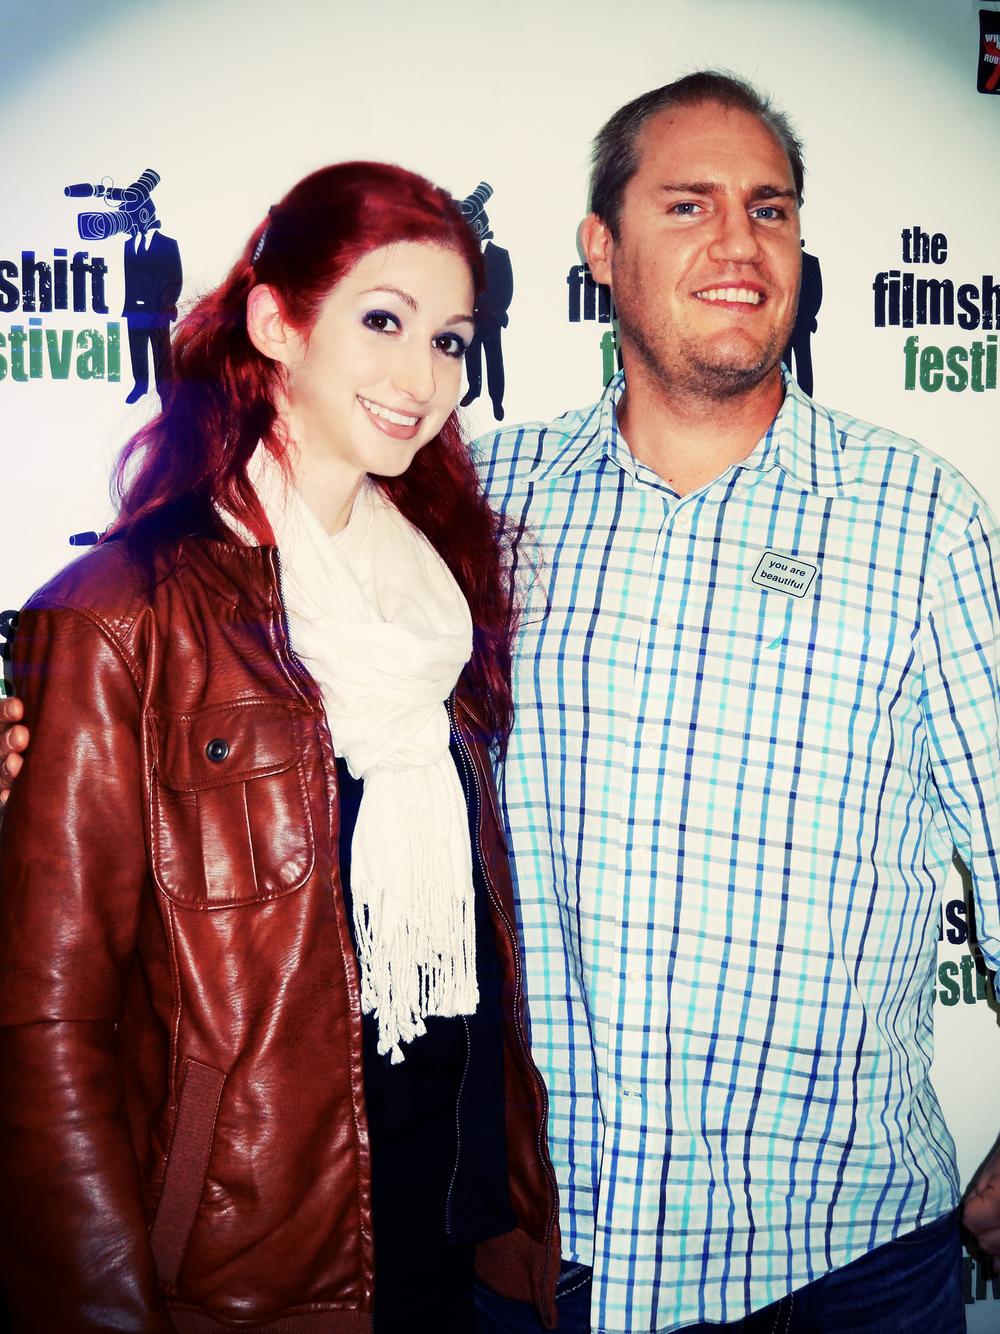 Geena Matuson (@geenamatuson) with FilmShift Producer Jed Hammel, 2013.